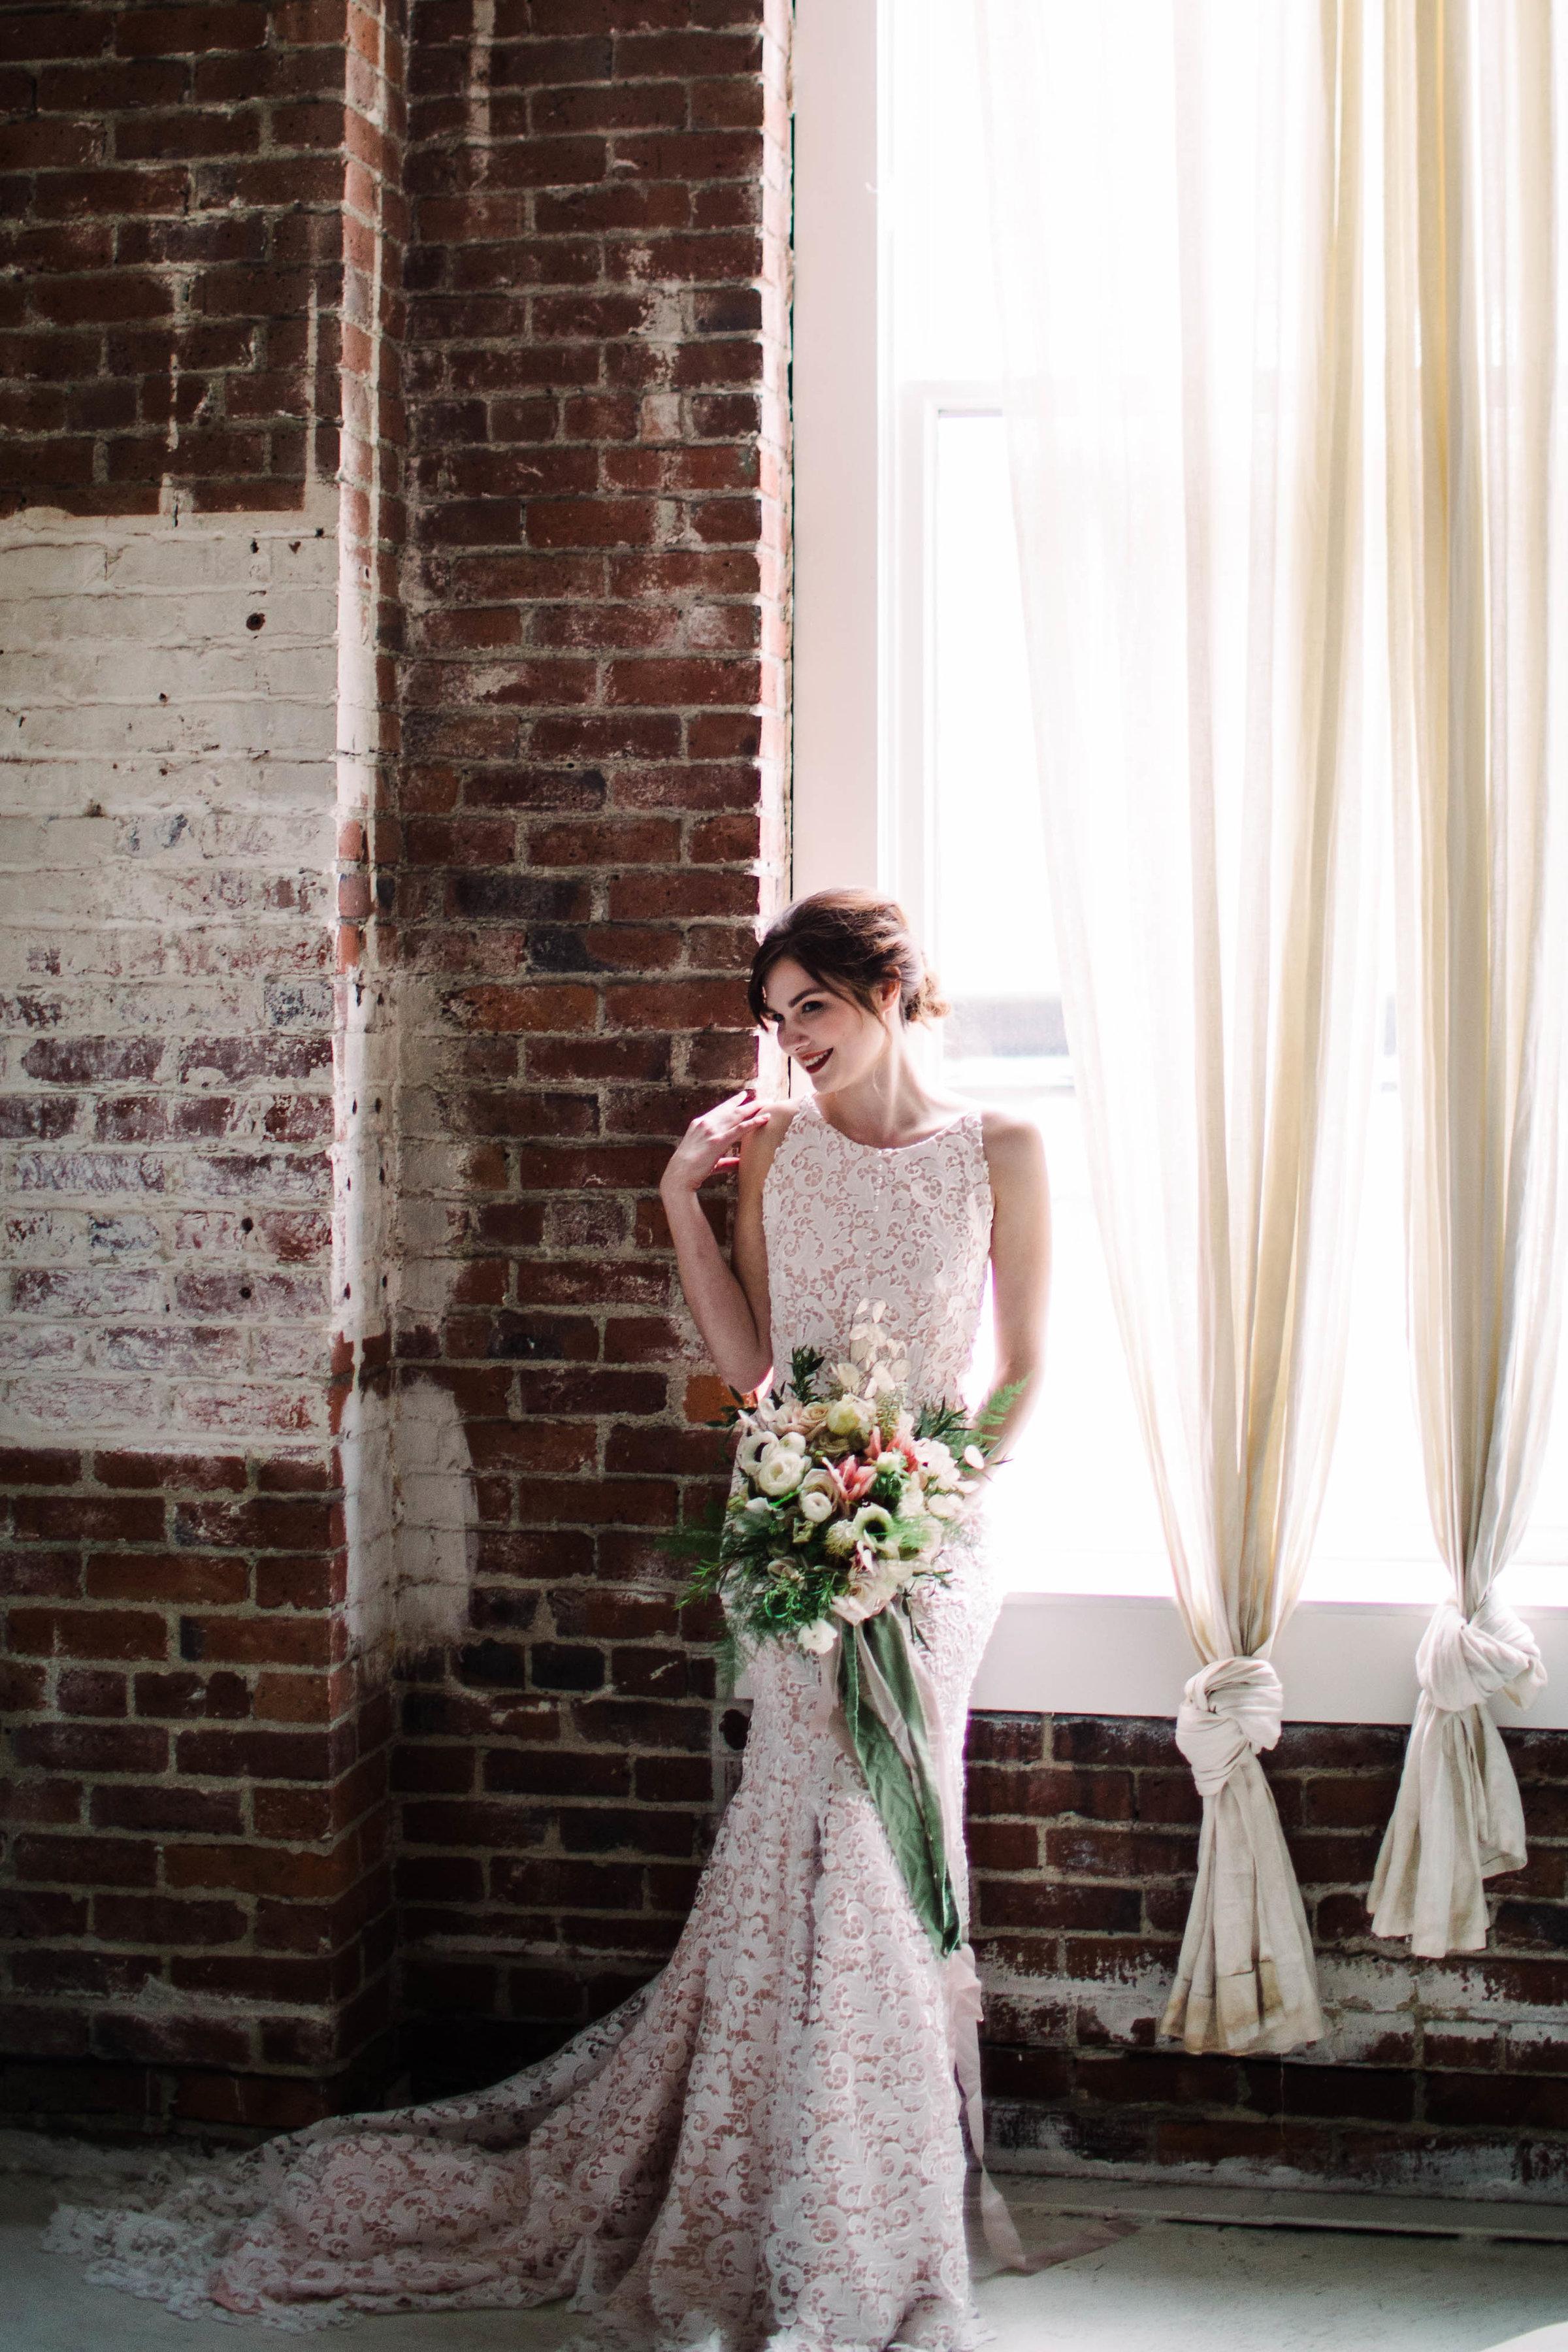 Sublime Stems | The Gathered Creatives | Seattle | Bridal | Julia Kinnunen Photography